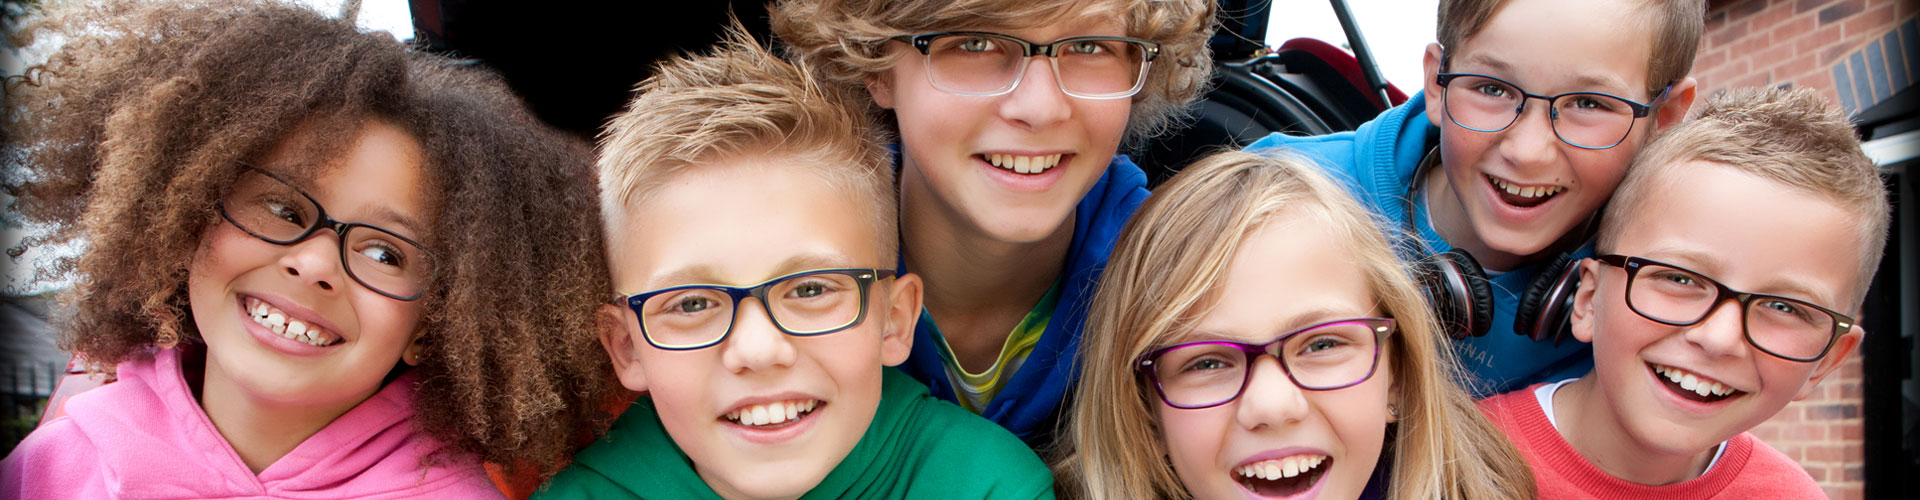 Childrens Glasses Lens And Frames In Cambridge Ryco Optics